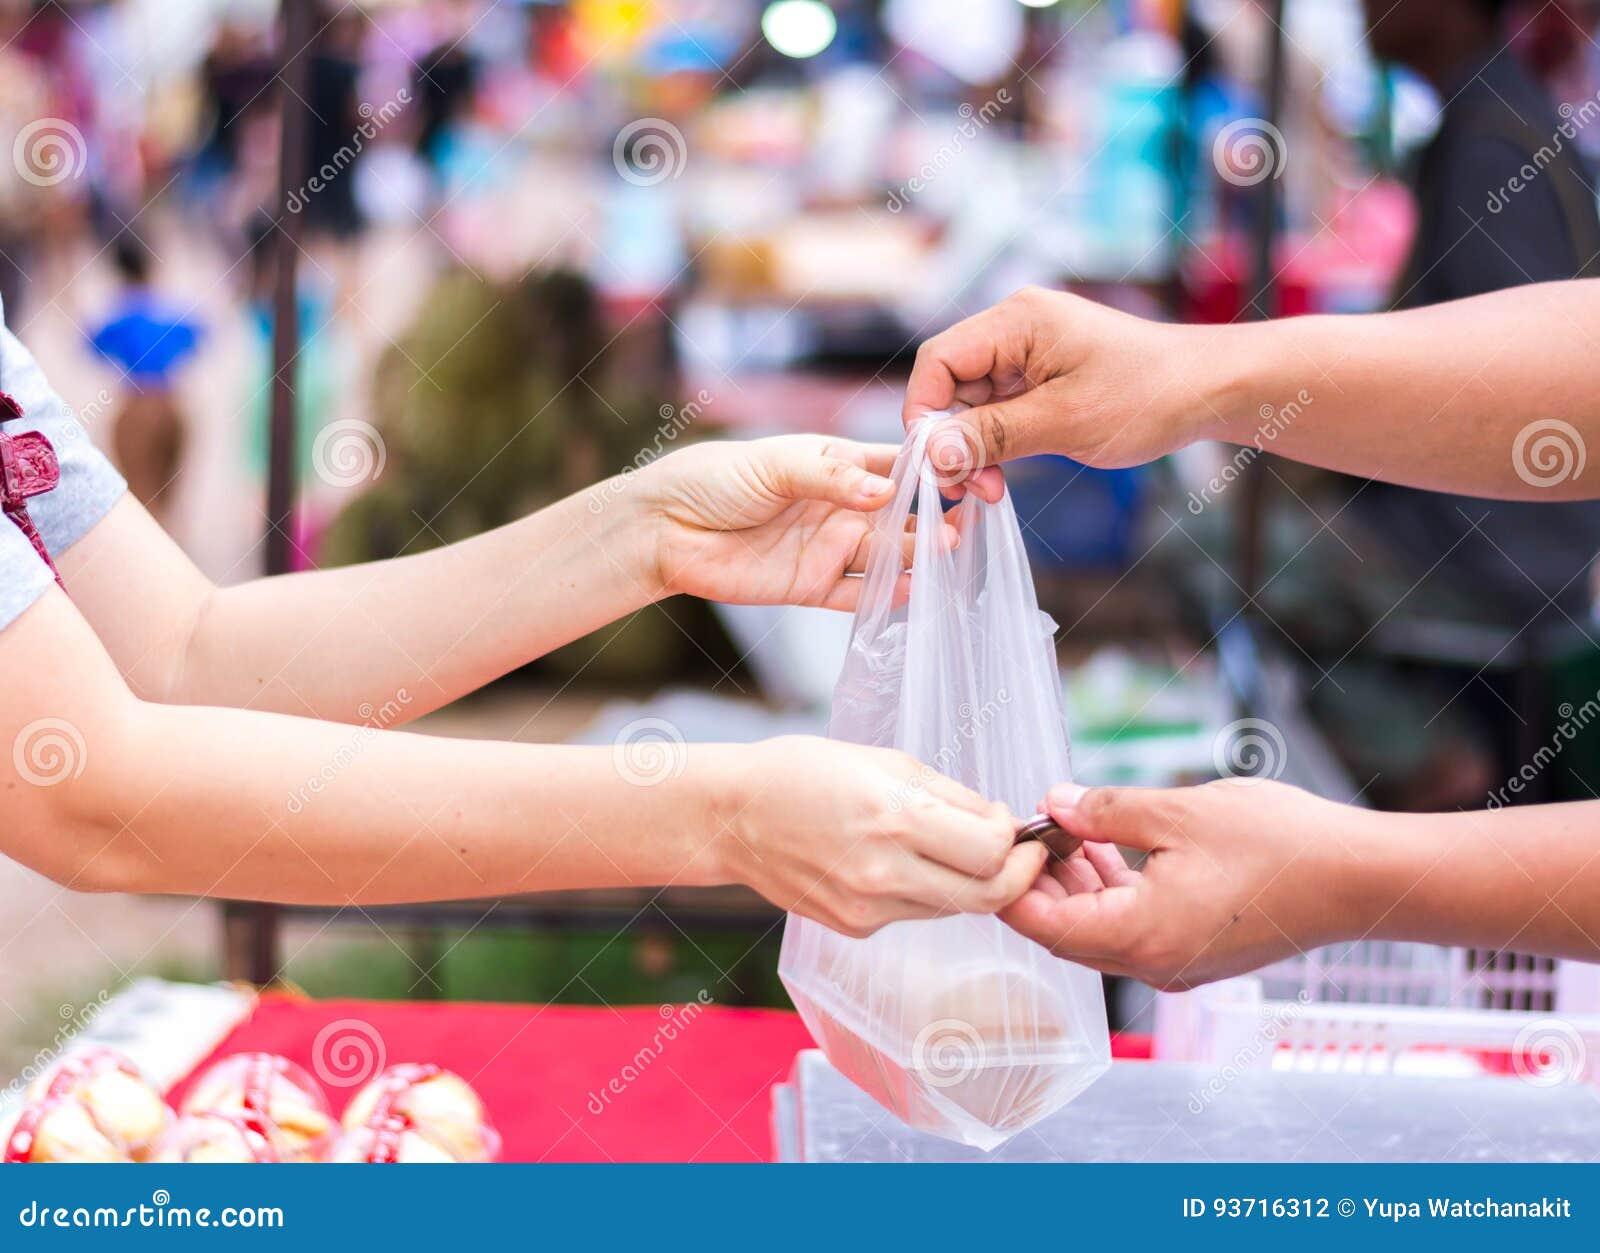 Customer paying bill by cash at market